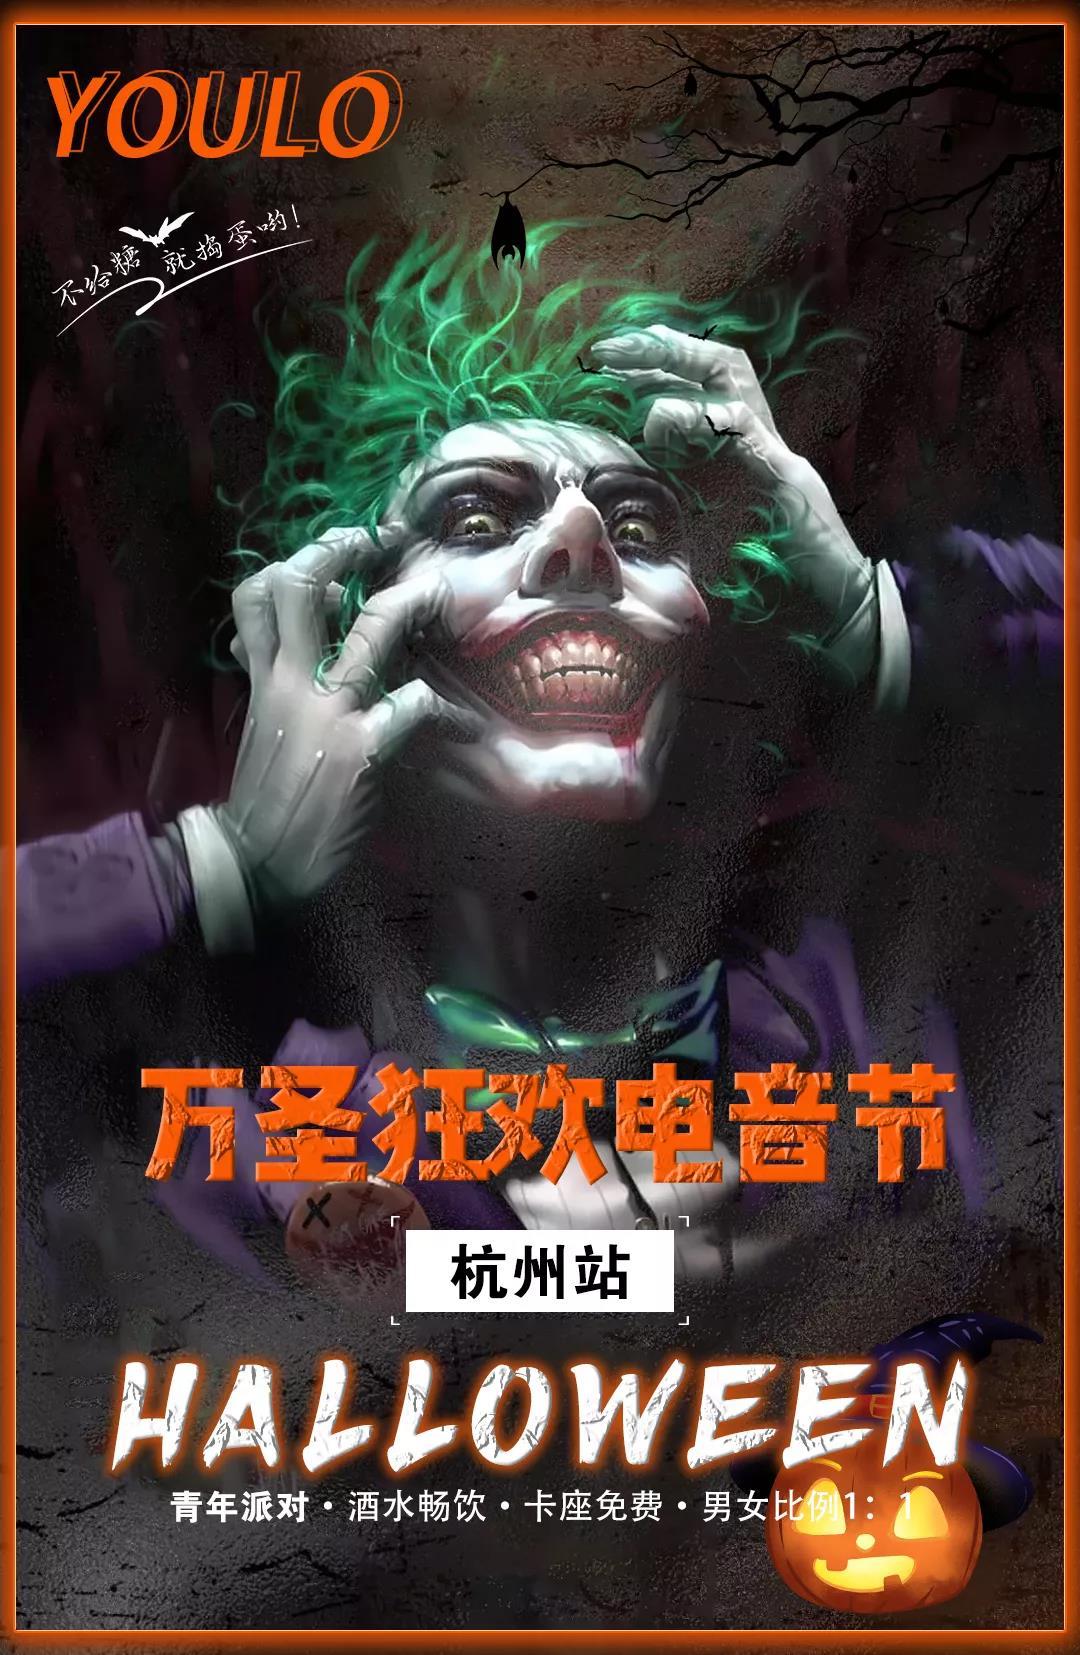 【杭州】YOULO万圣电音节杭州站